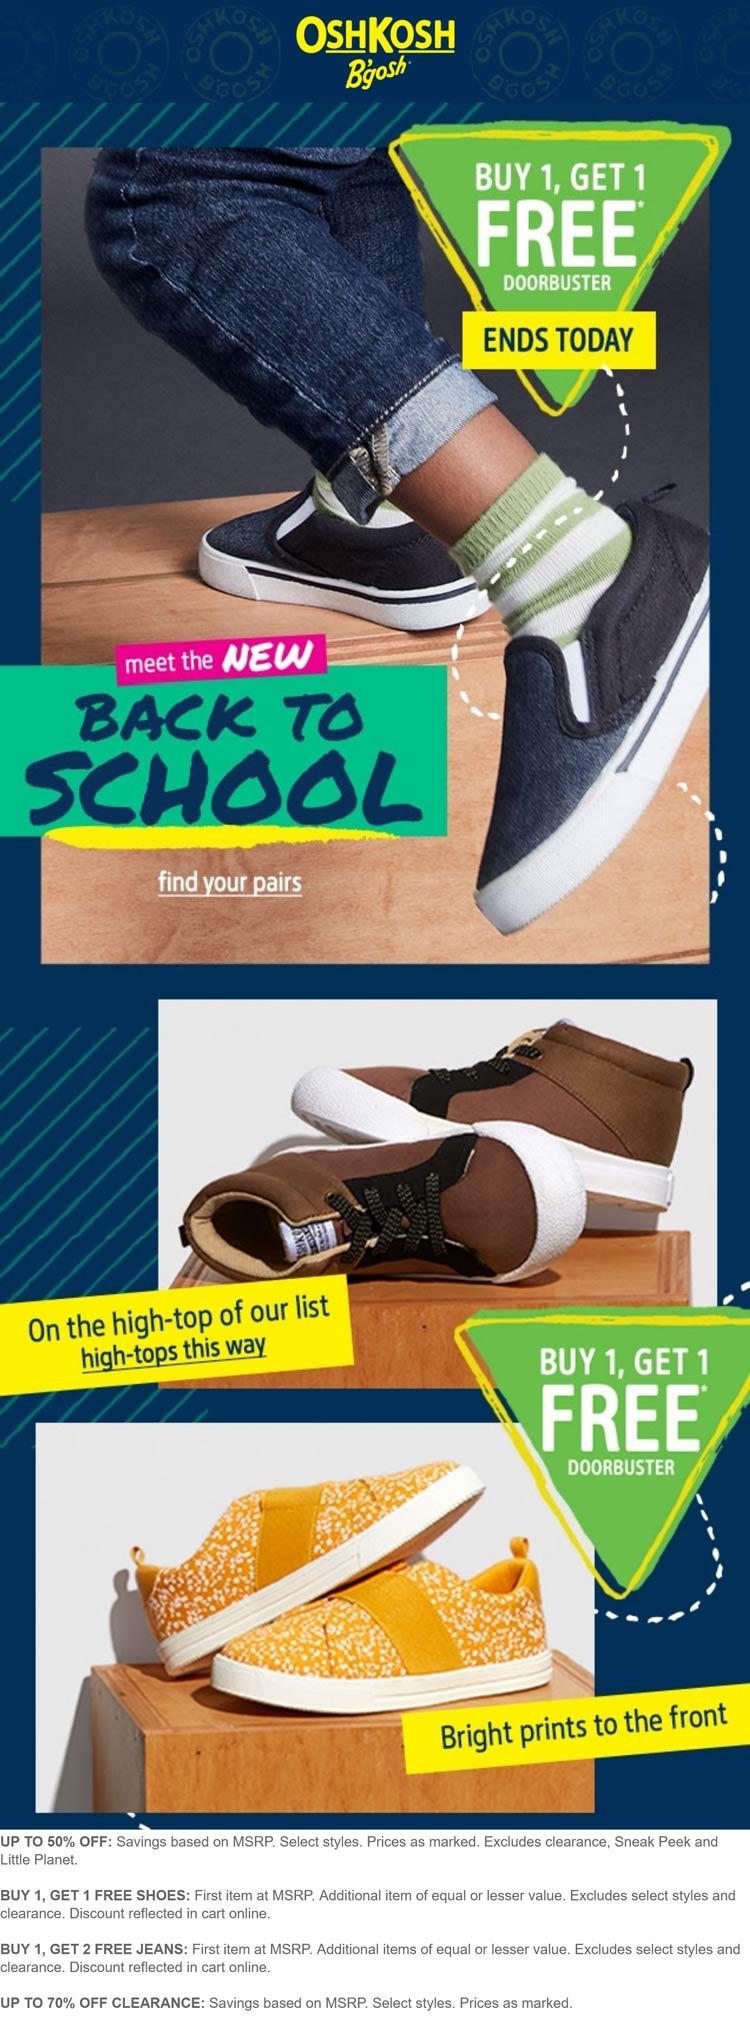 OshKosh Bgosh stores Coupon  Second shoes & 3rd jeans free at OshKosh Bgosh #oshkoshbgosh